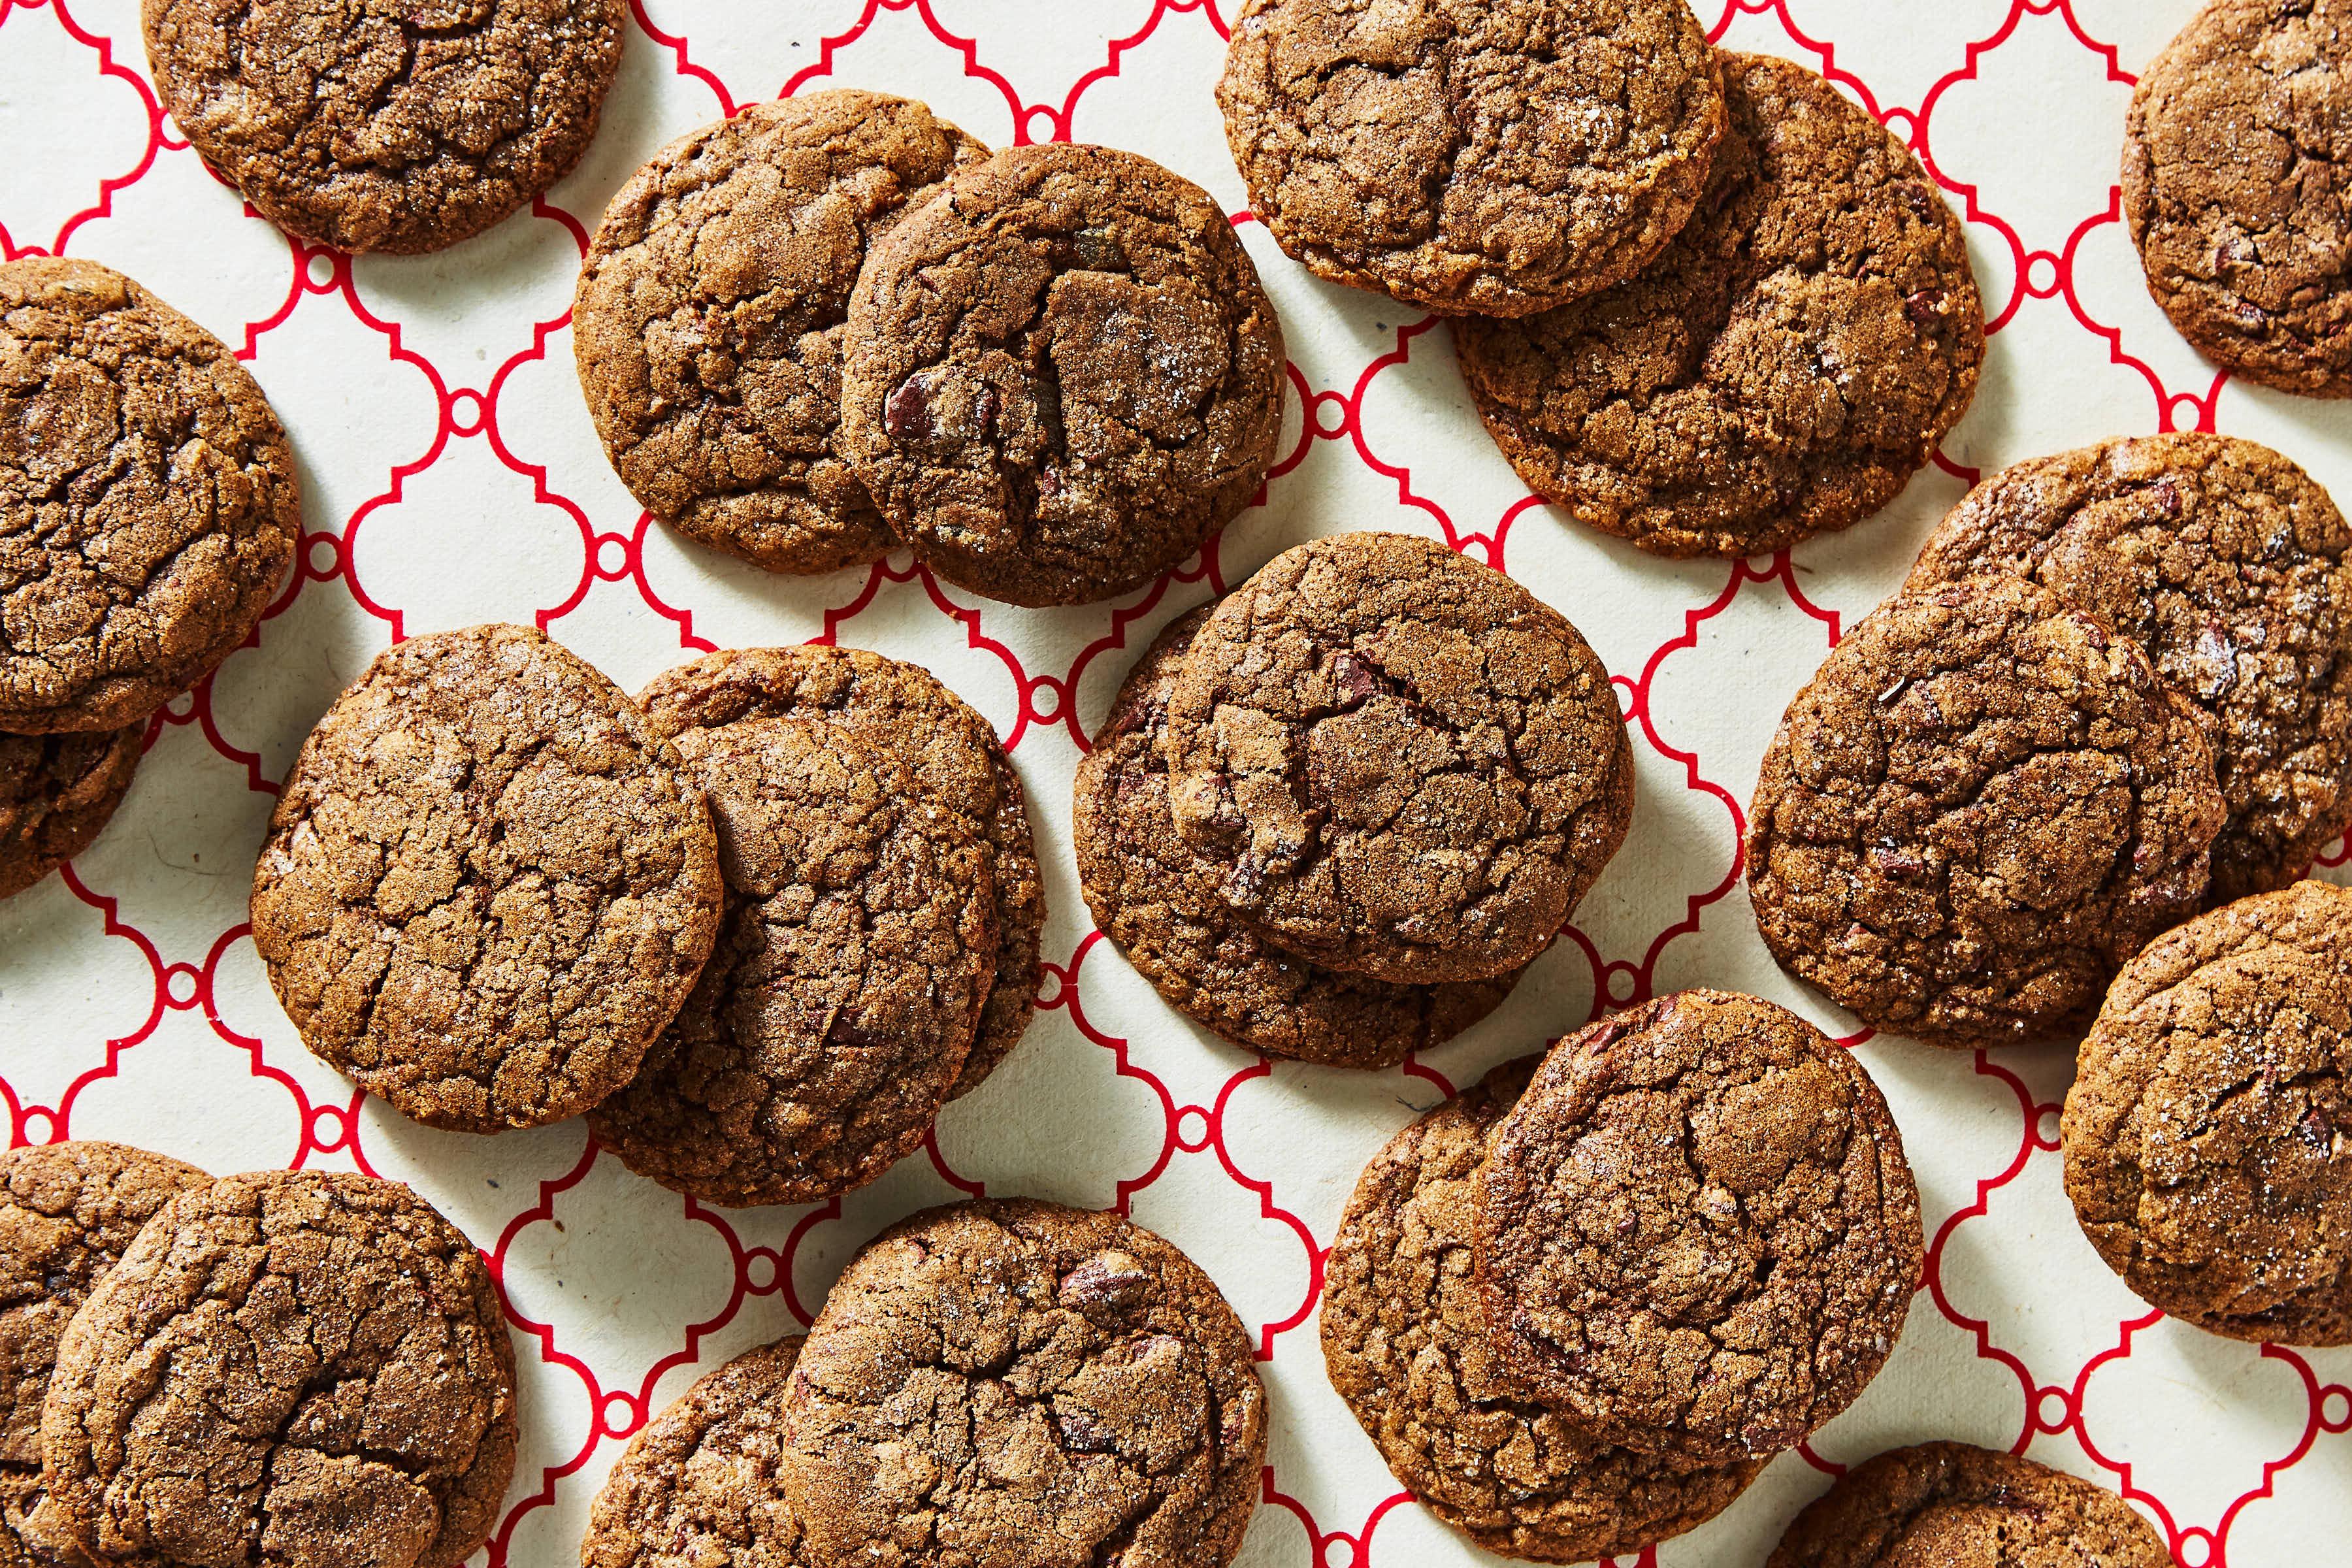 Martha Stewart Holiday Box: Chewy Chocolate Cookie